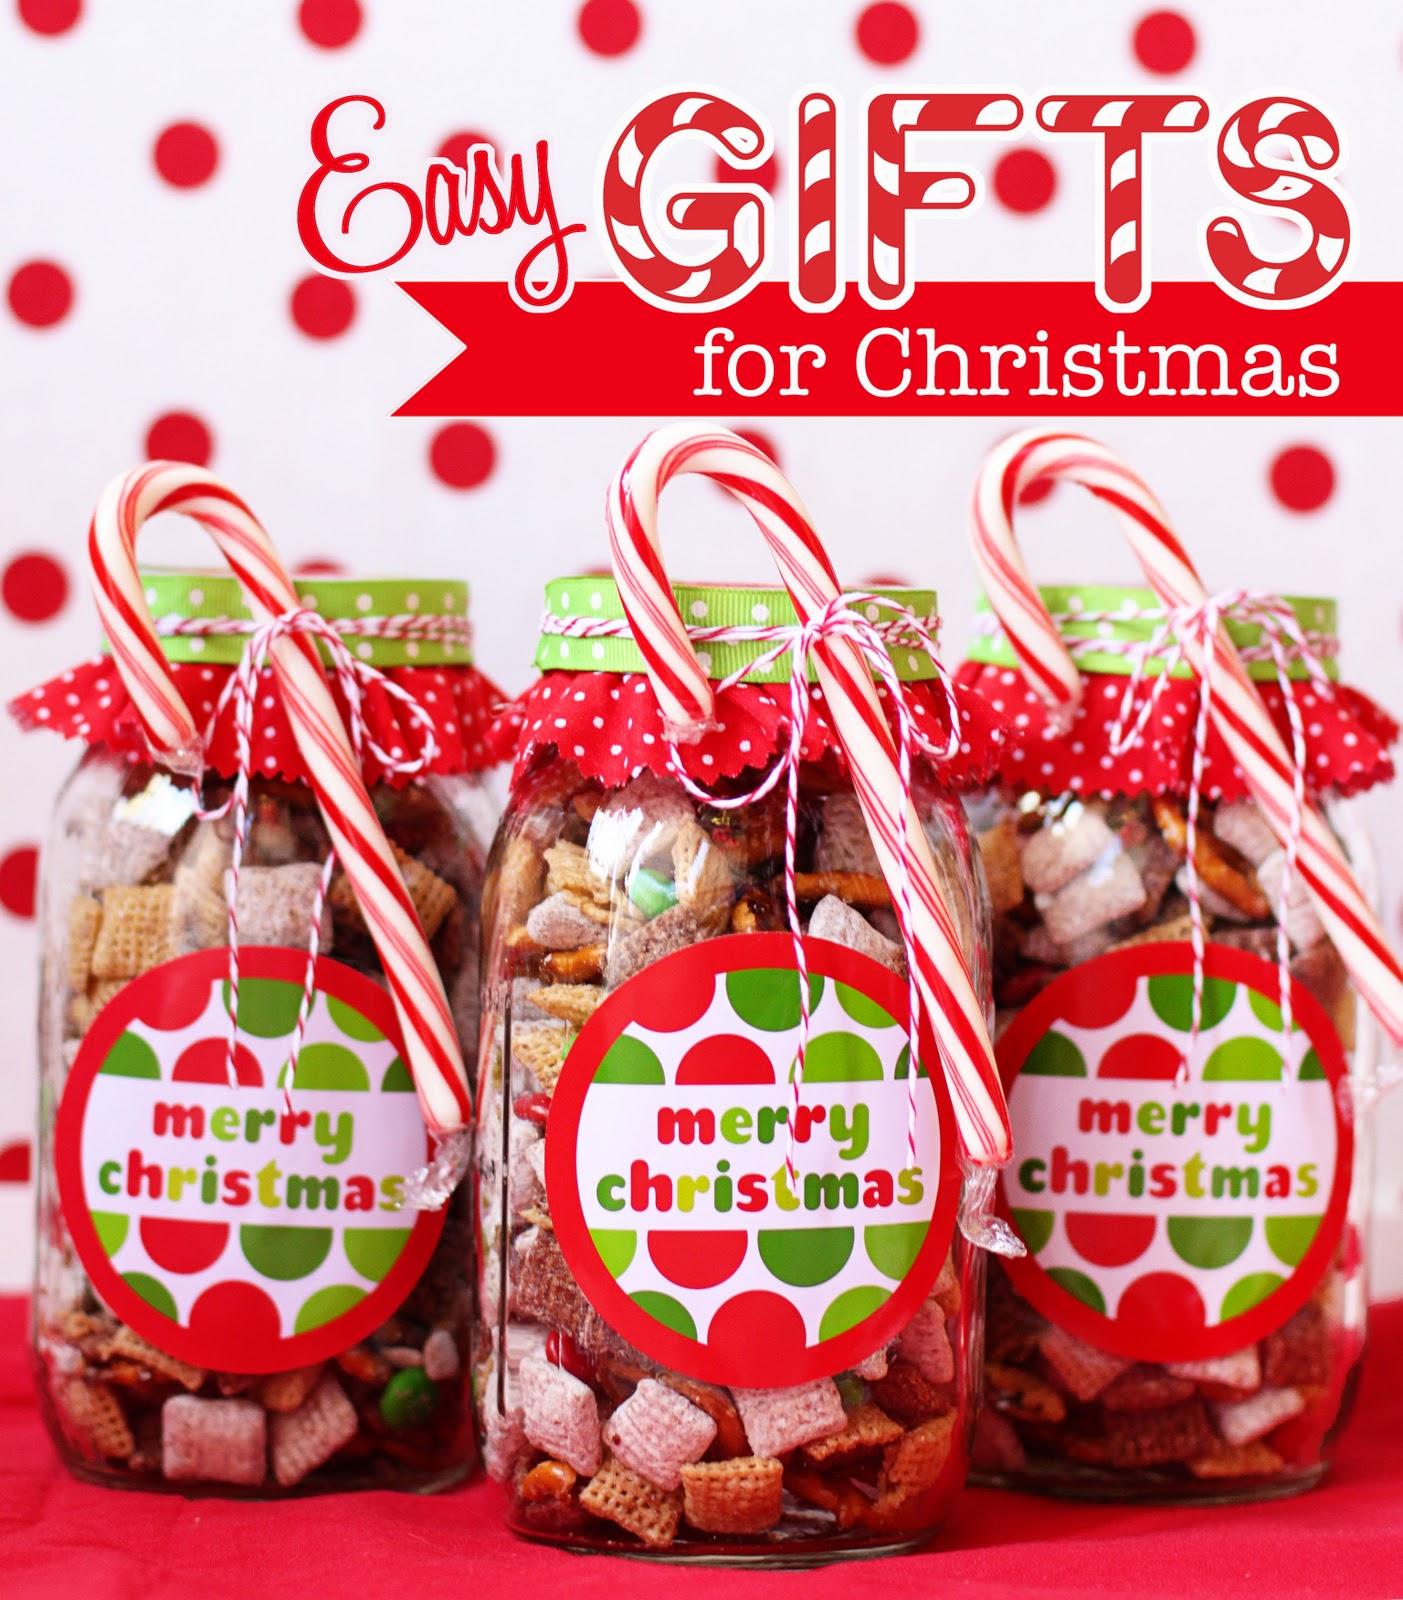 How To Make Handmade Chex Mix Holiday Gifts & Bonus Free Printable